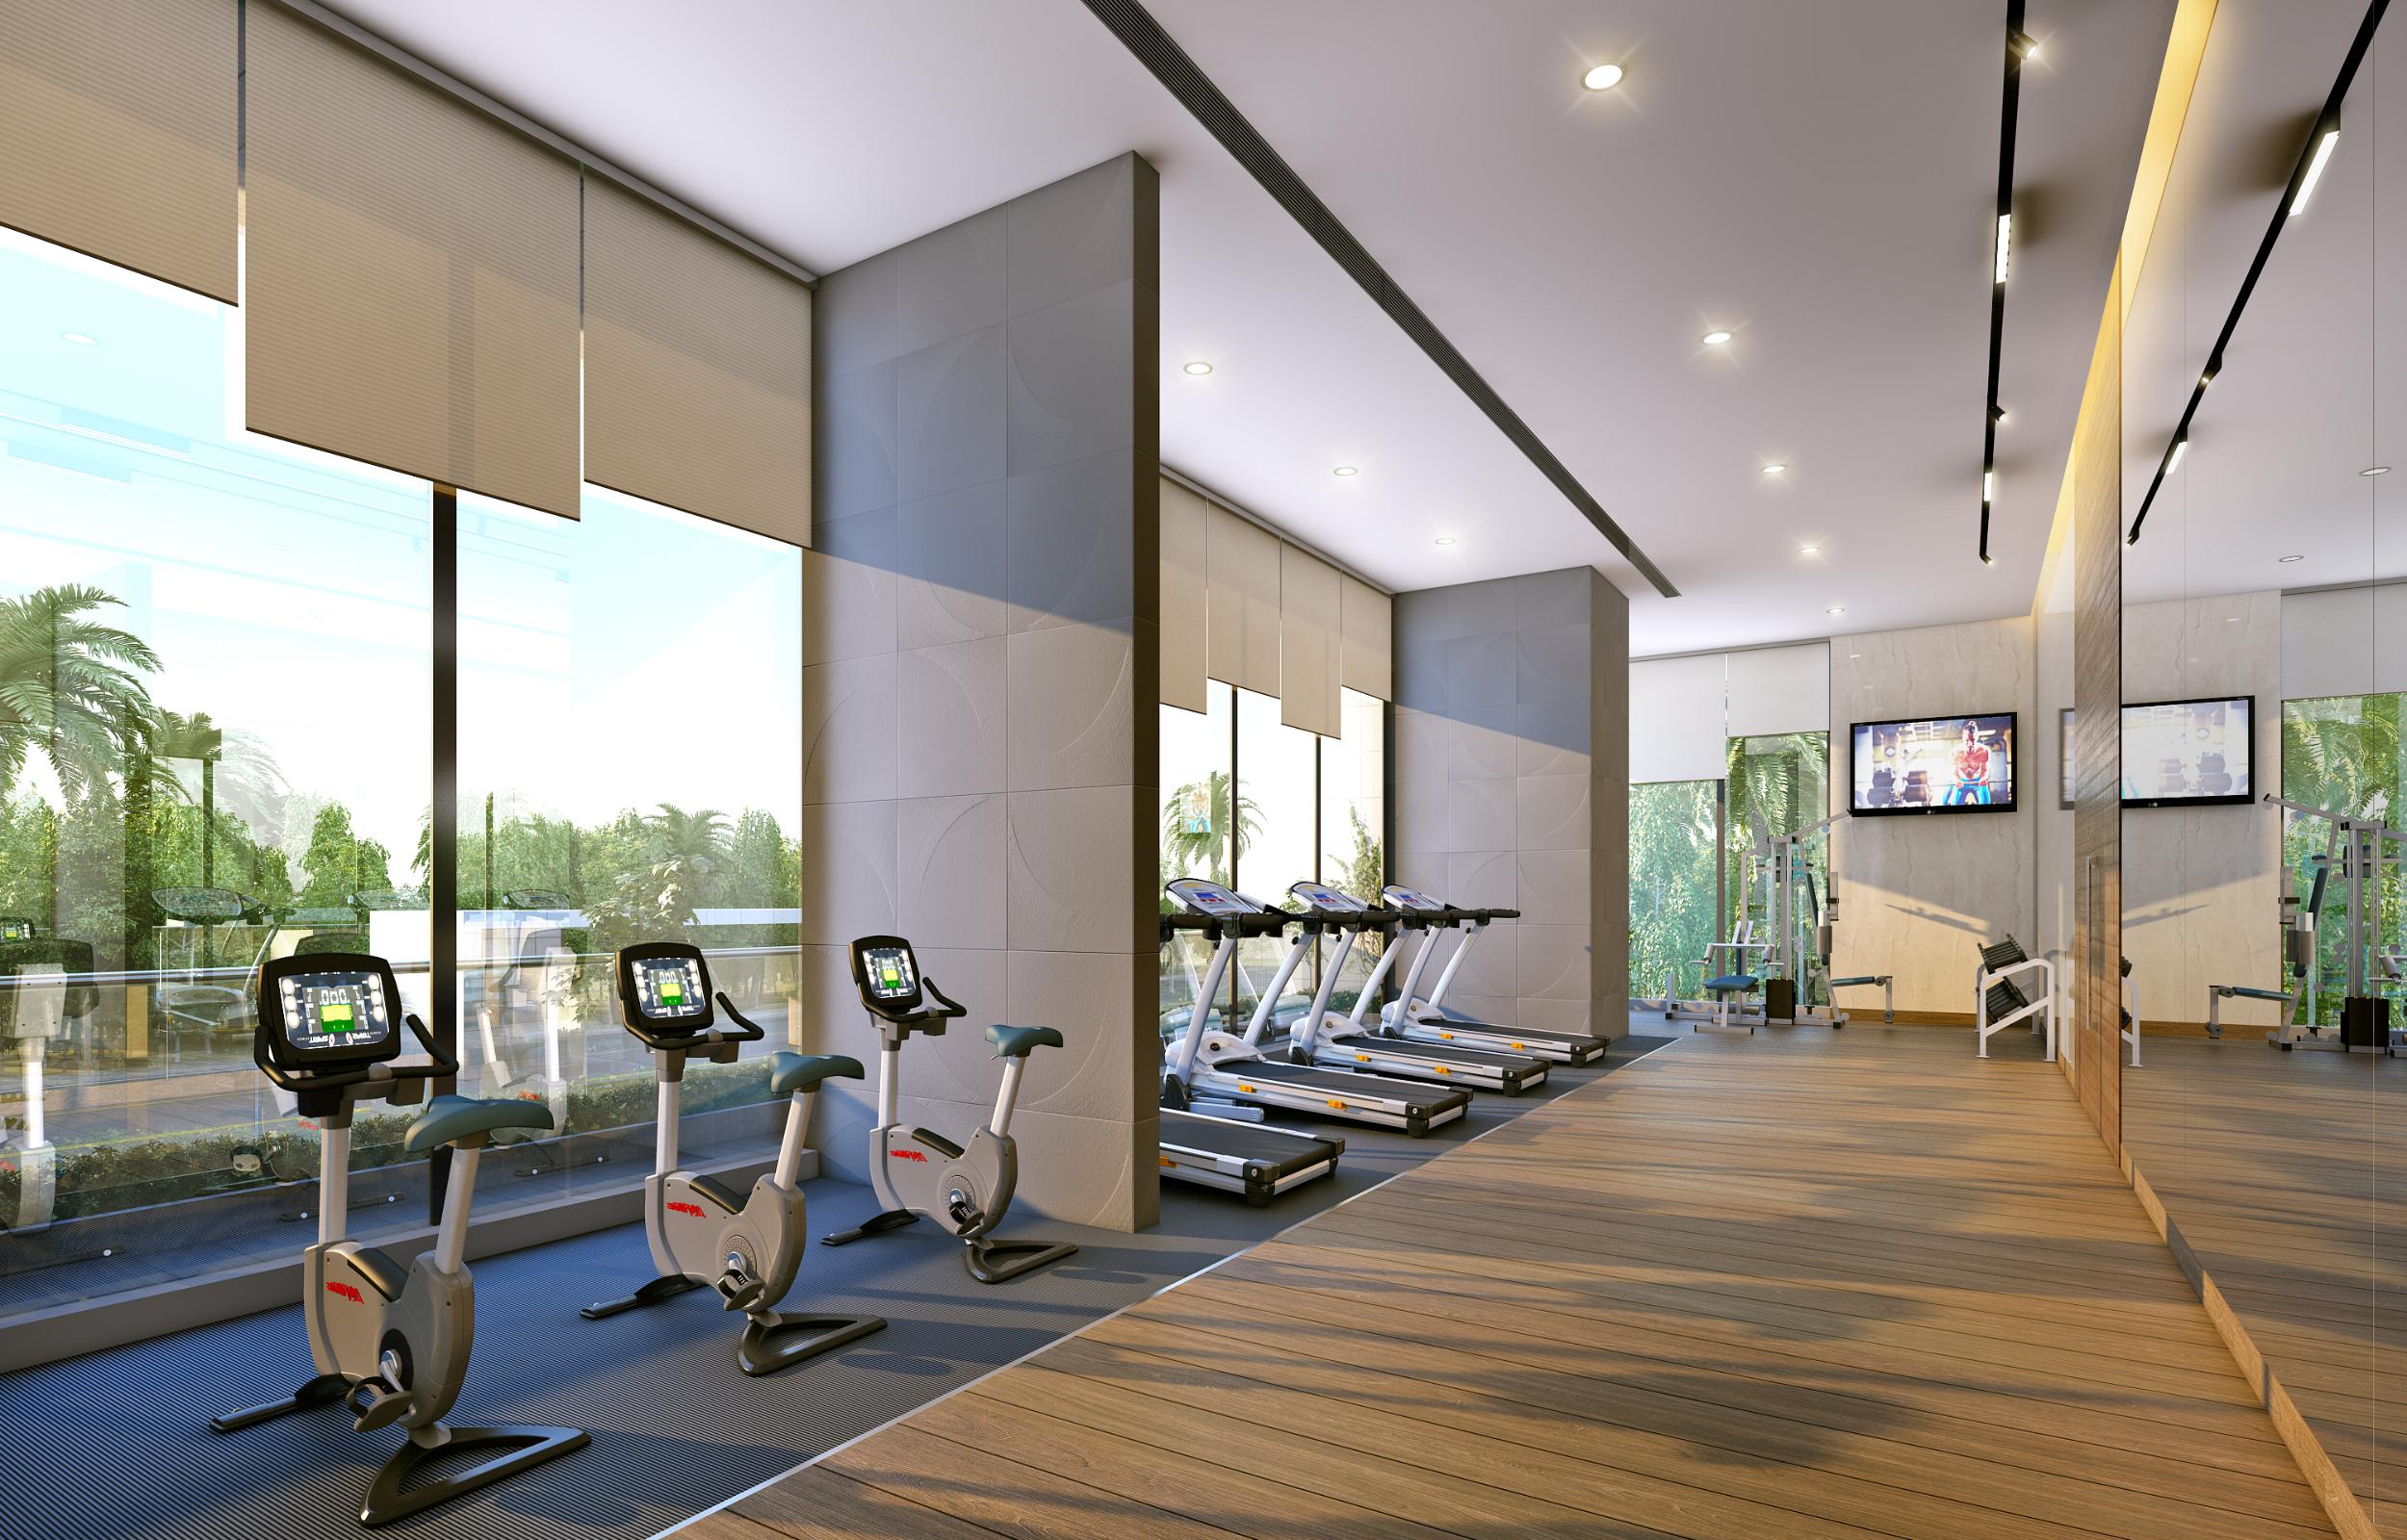 Infinty Gym